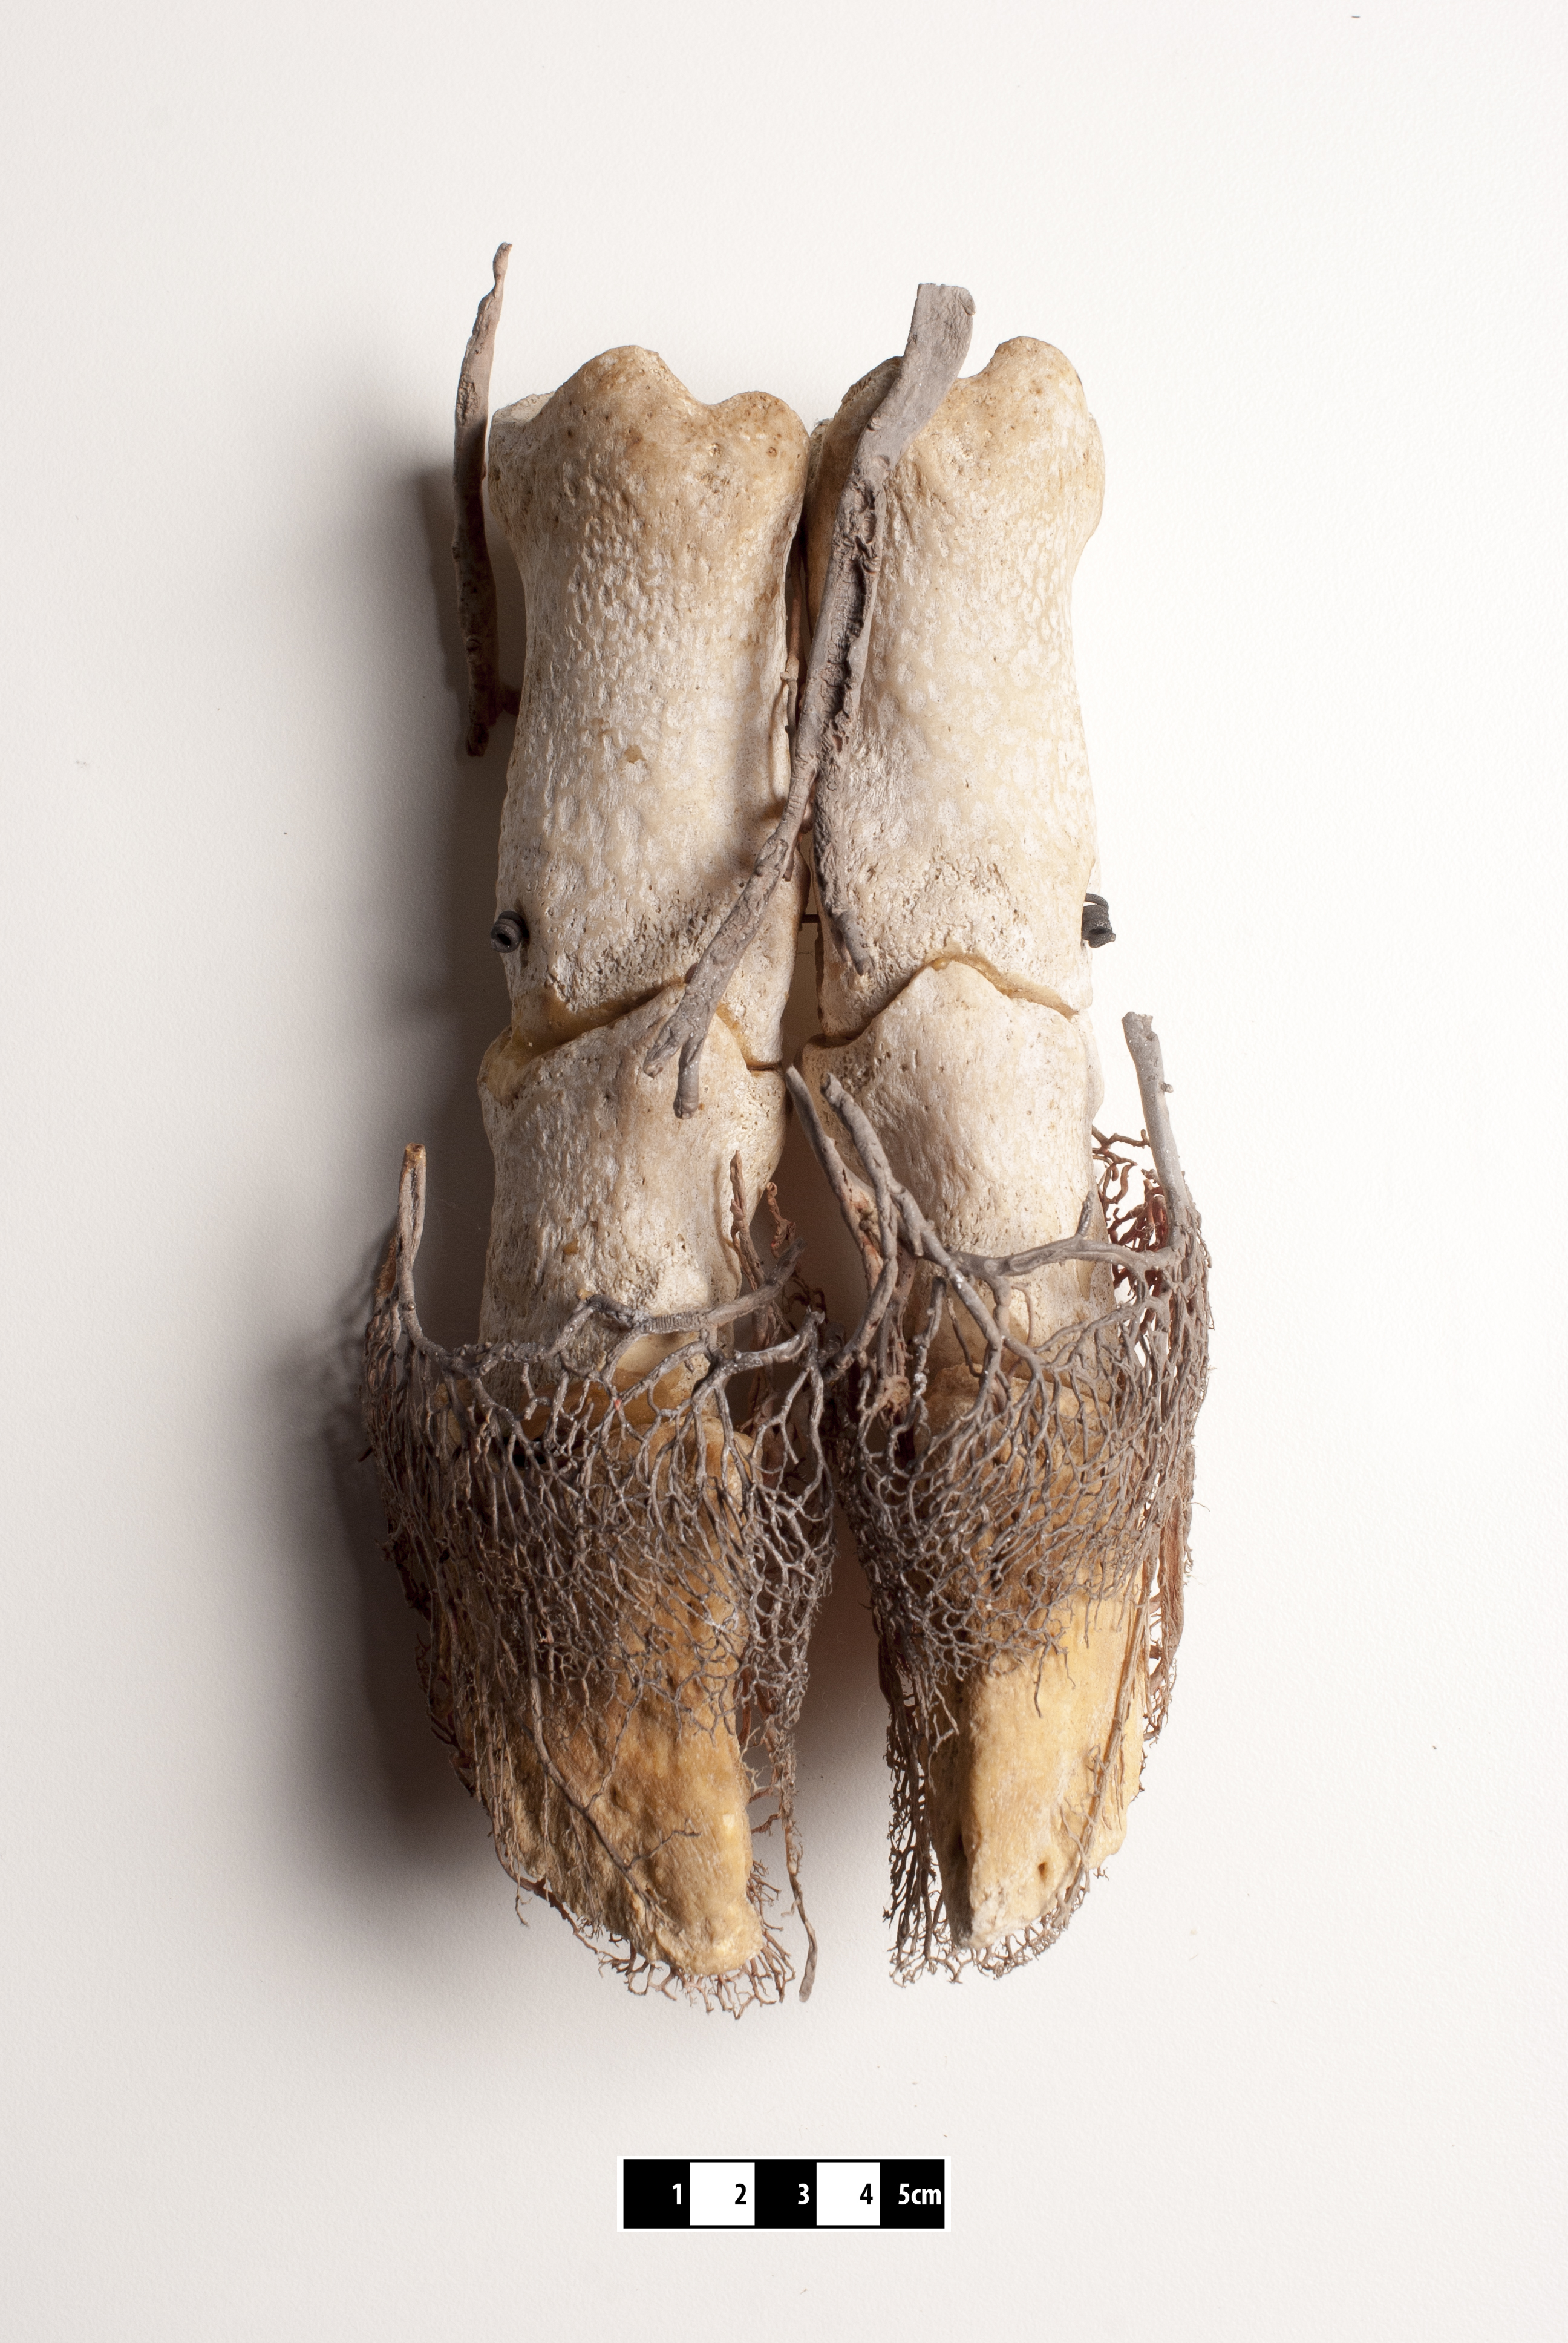 File:Domestic pig anatomy.jpg - Wikimedia Commons